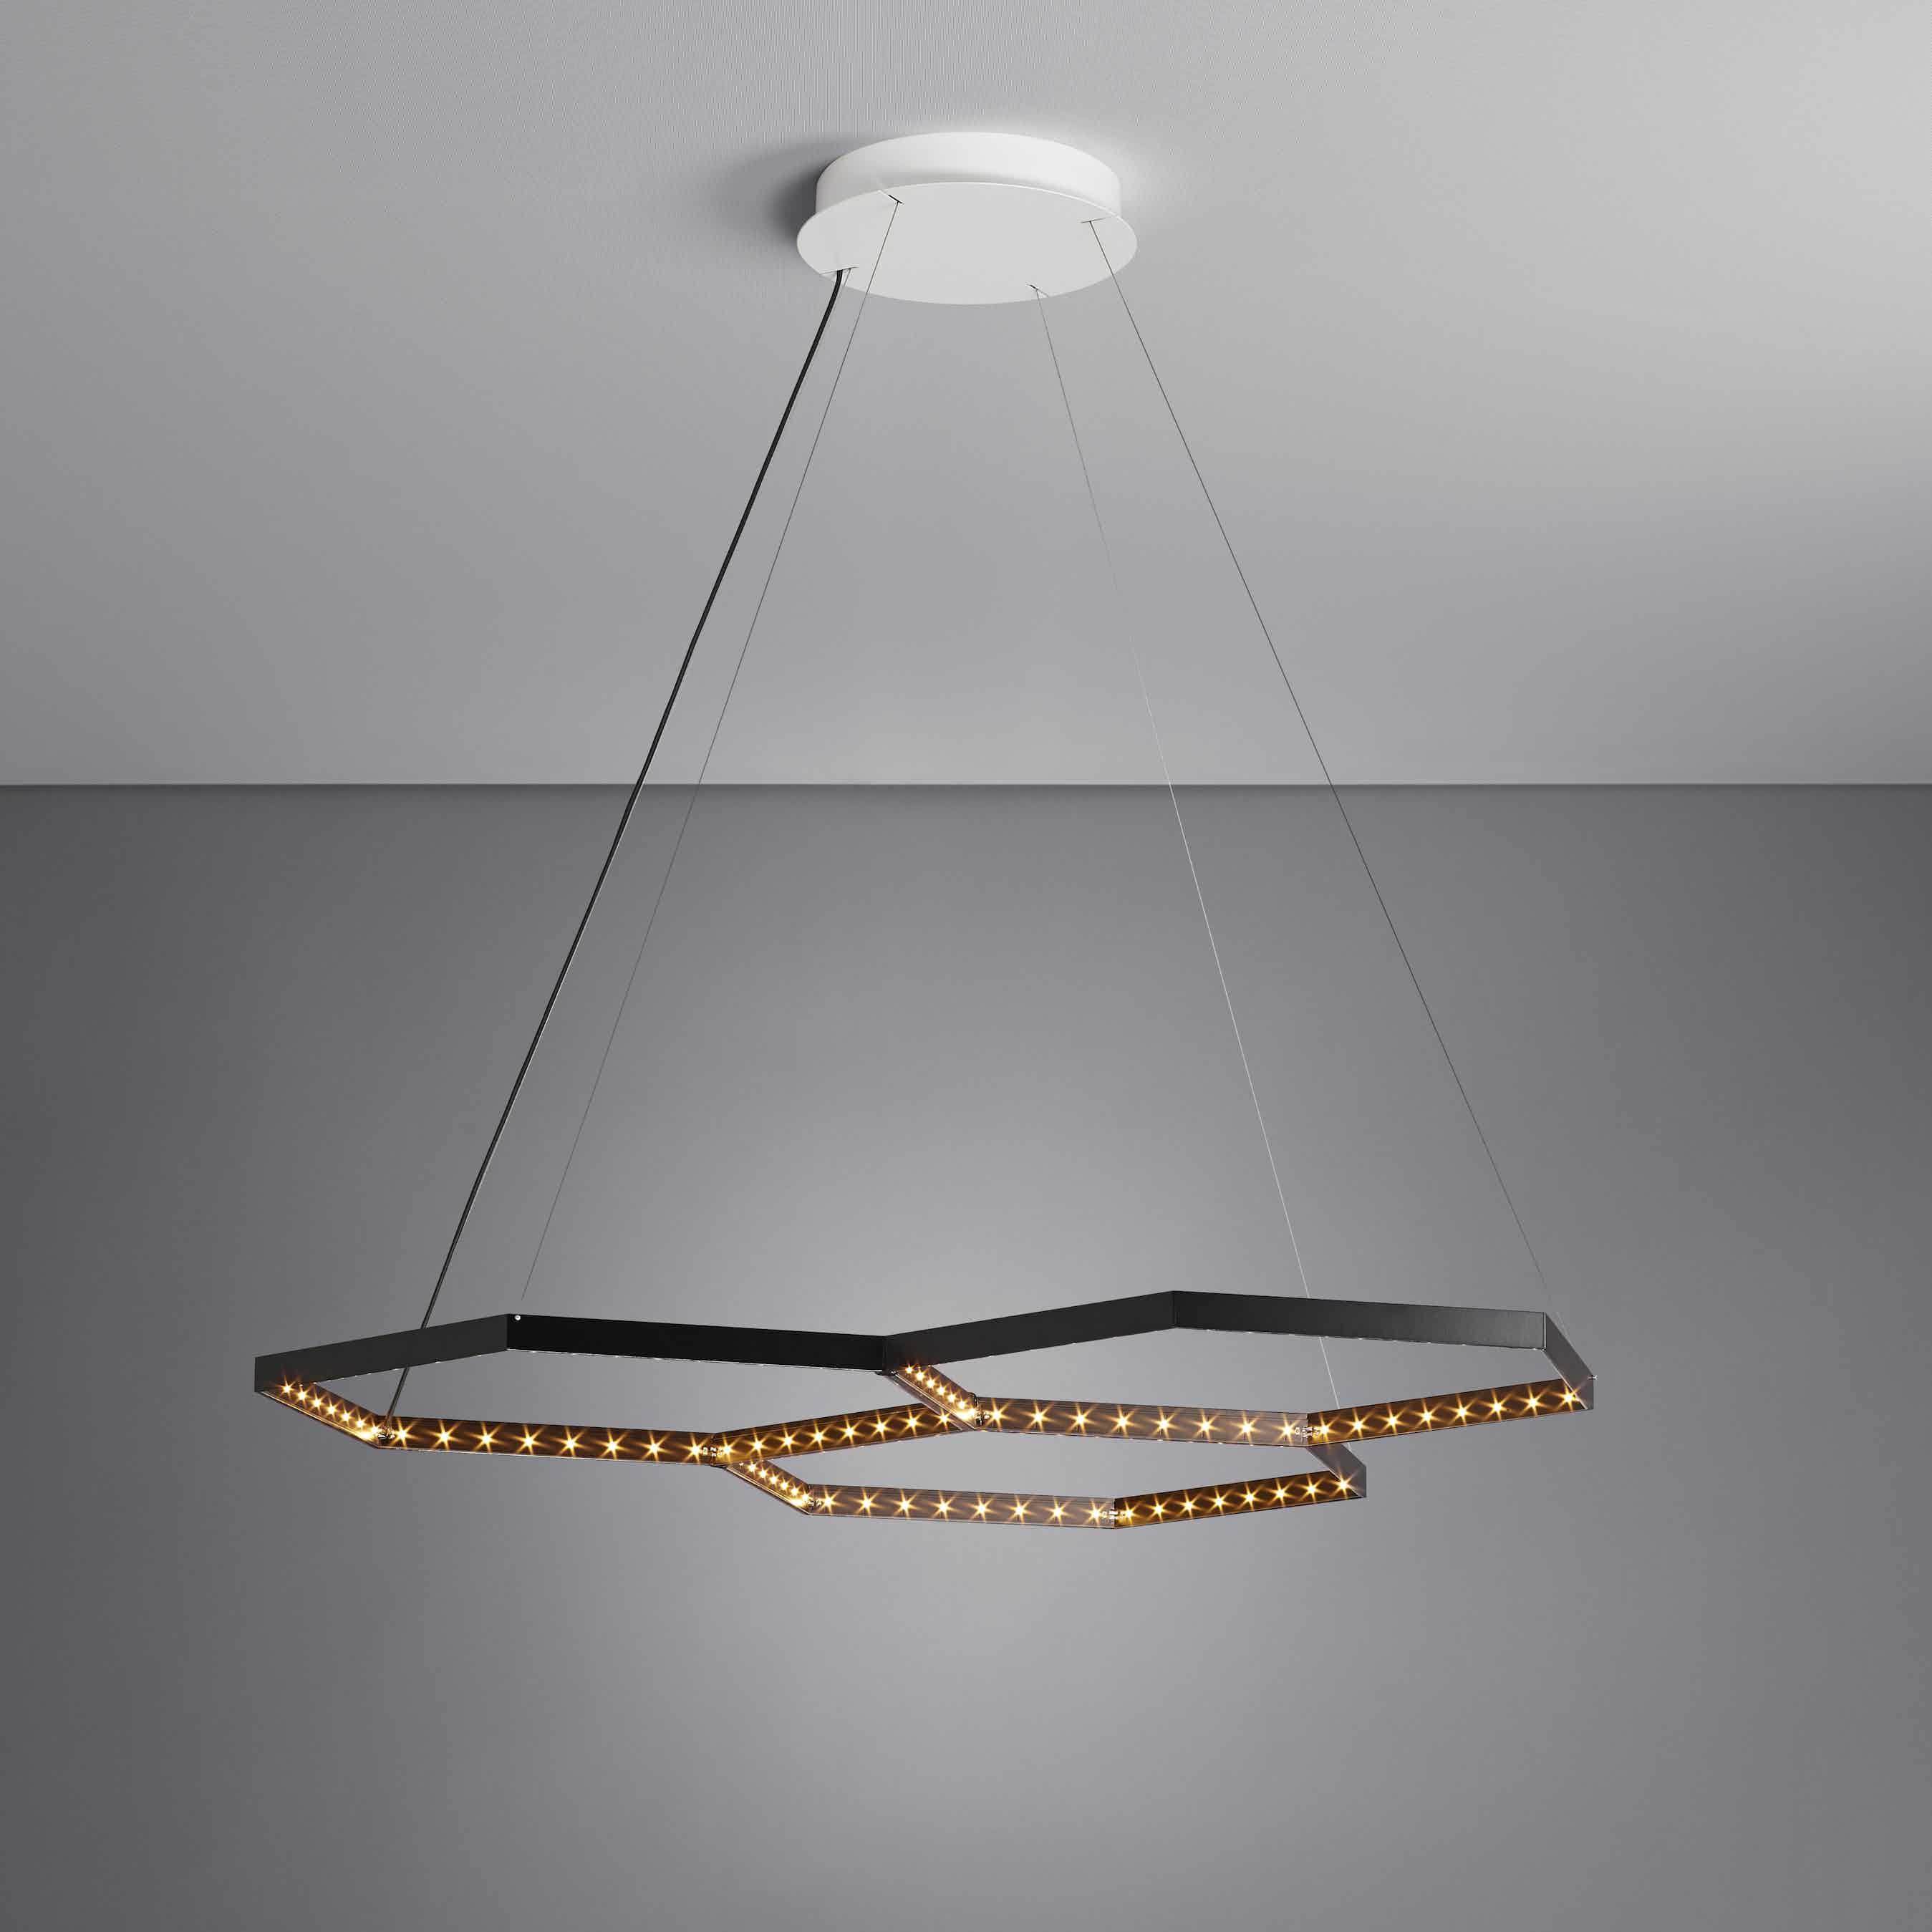 Le-deun-luminaires-hexa-3-hanging-lamp-black-ceiling-haute-living